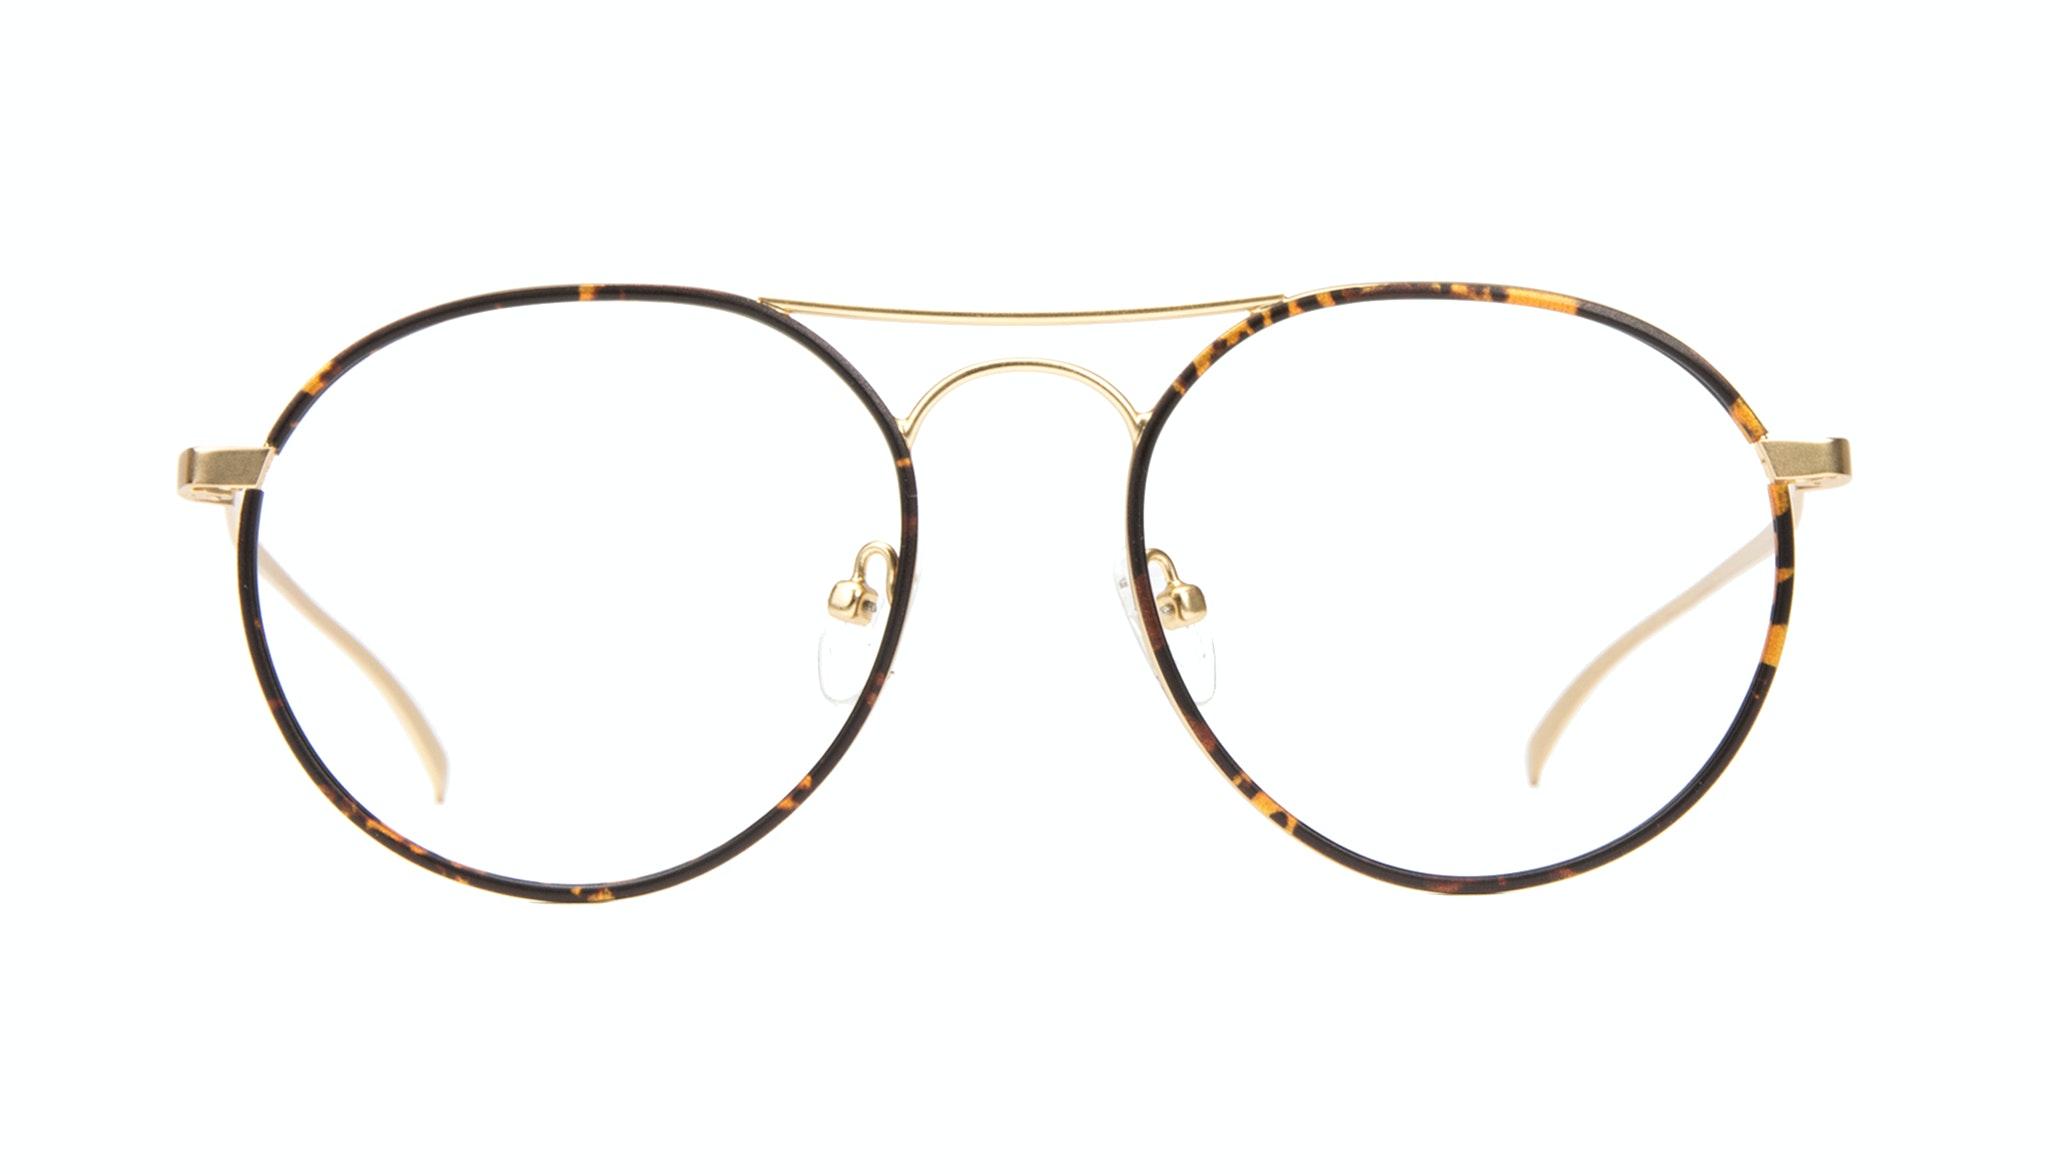 Affordable Fashion Glasses Aviator Round Eyeglasses Men Contour Tortoise